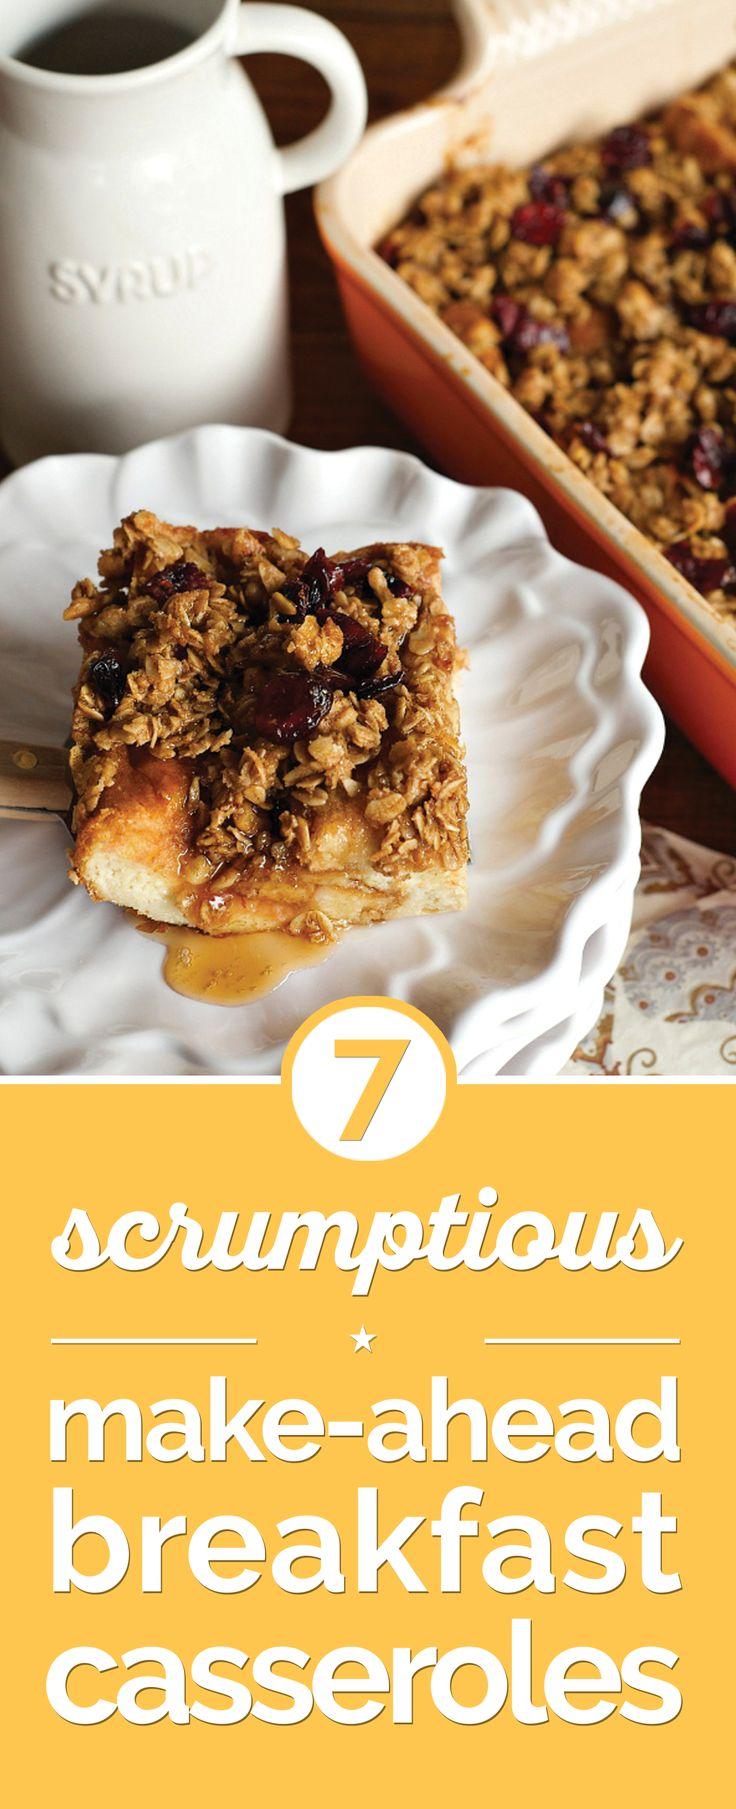 7 Scrumptious Make-Ahead Breakfast Casseroles - thegoodstuff